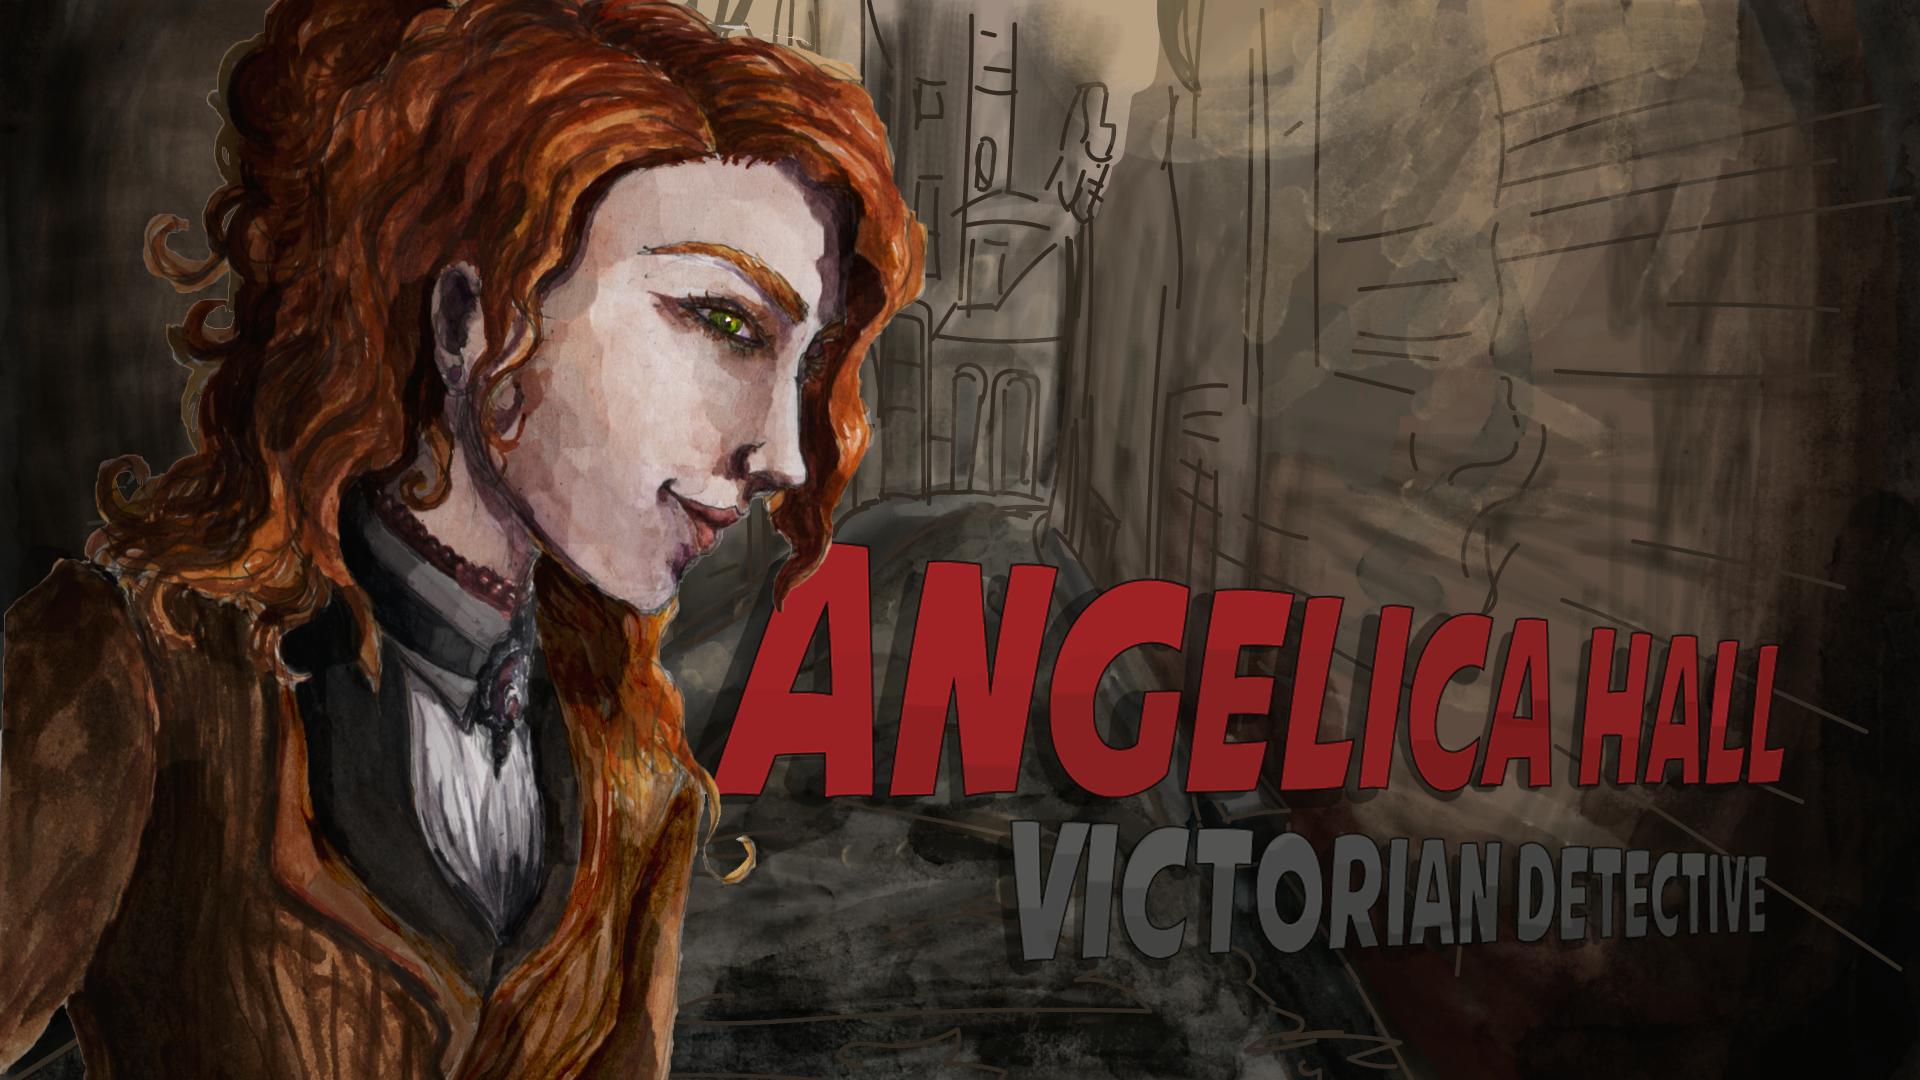 Angelica Hall: Victorian Detective